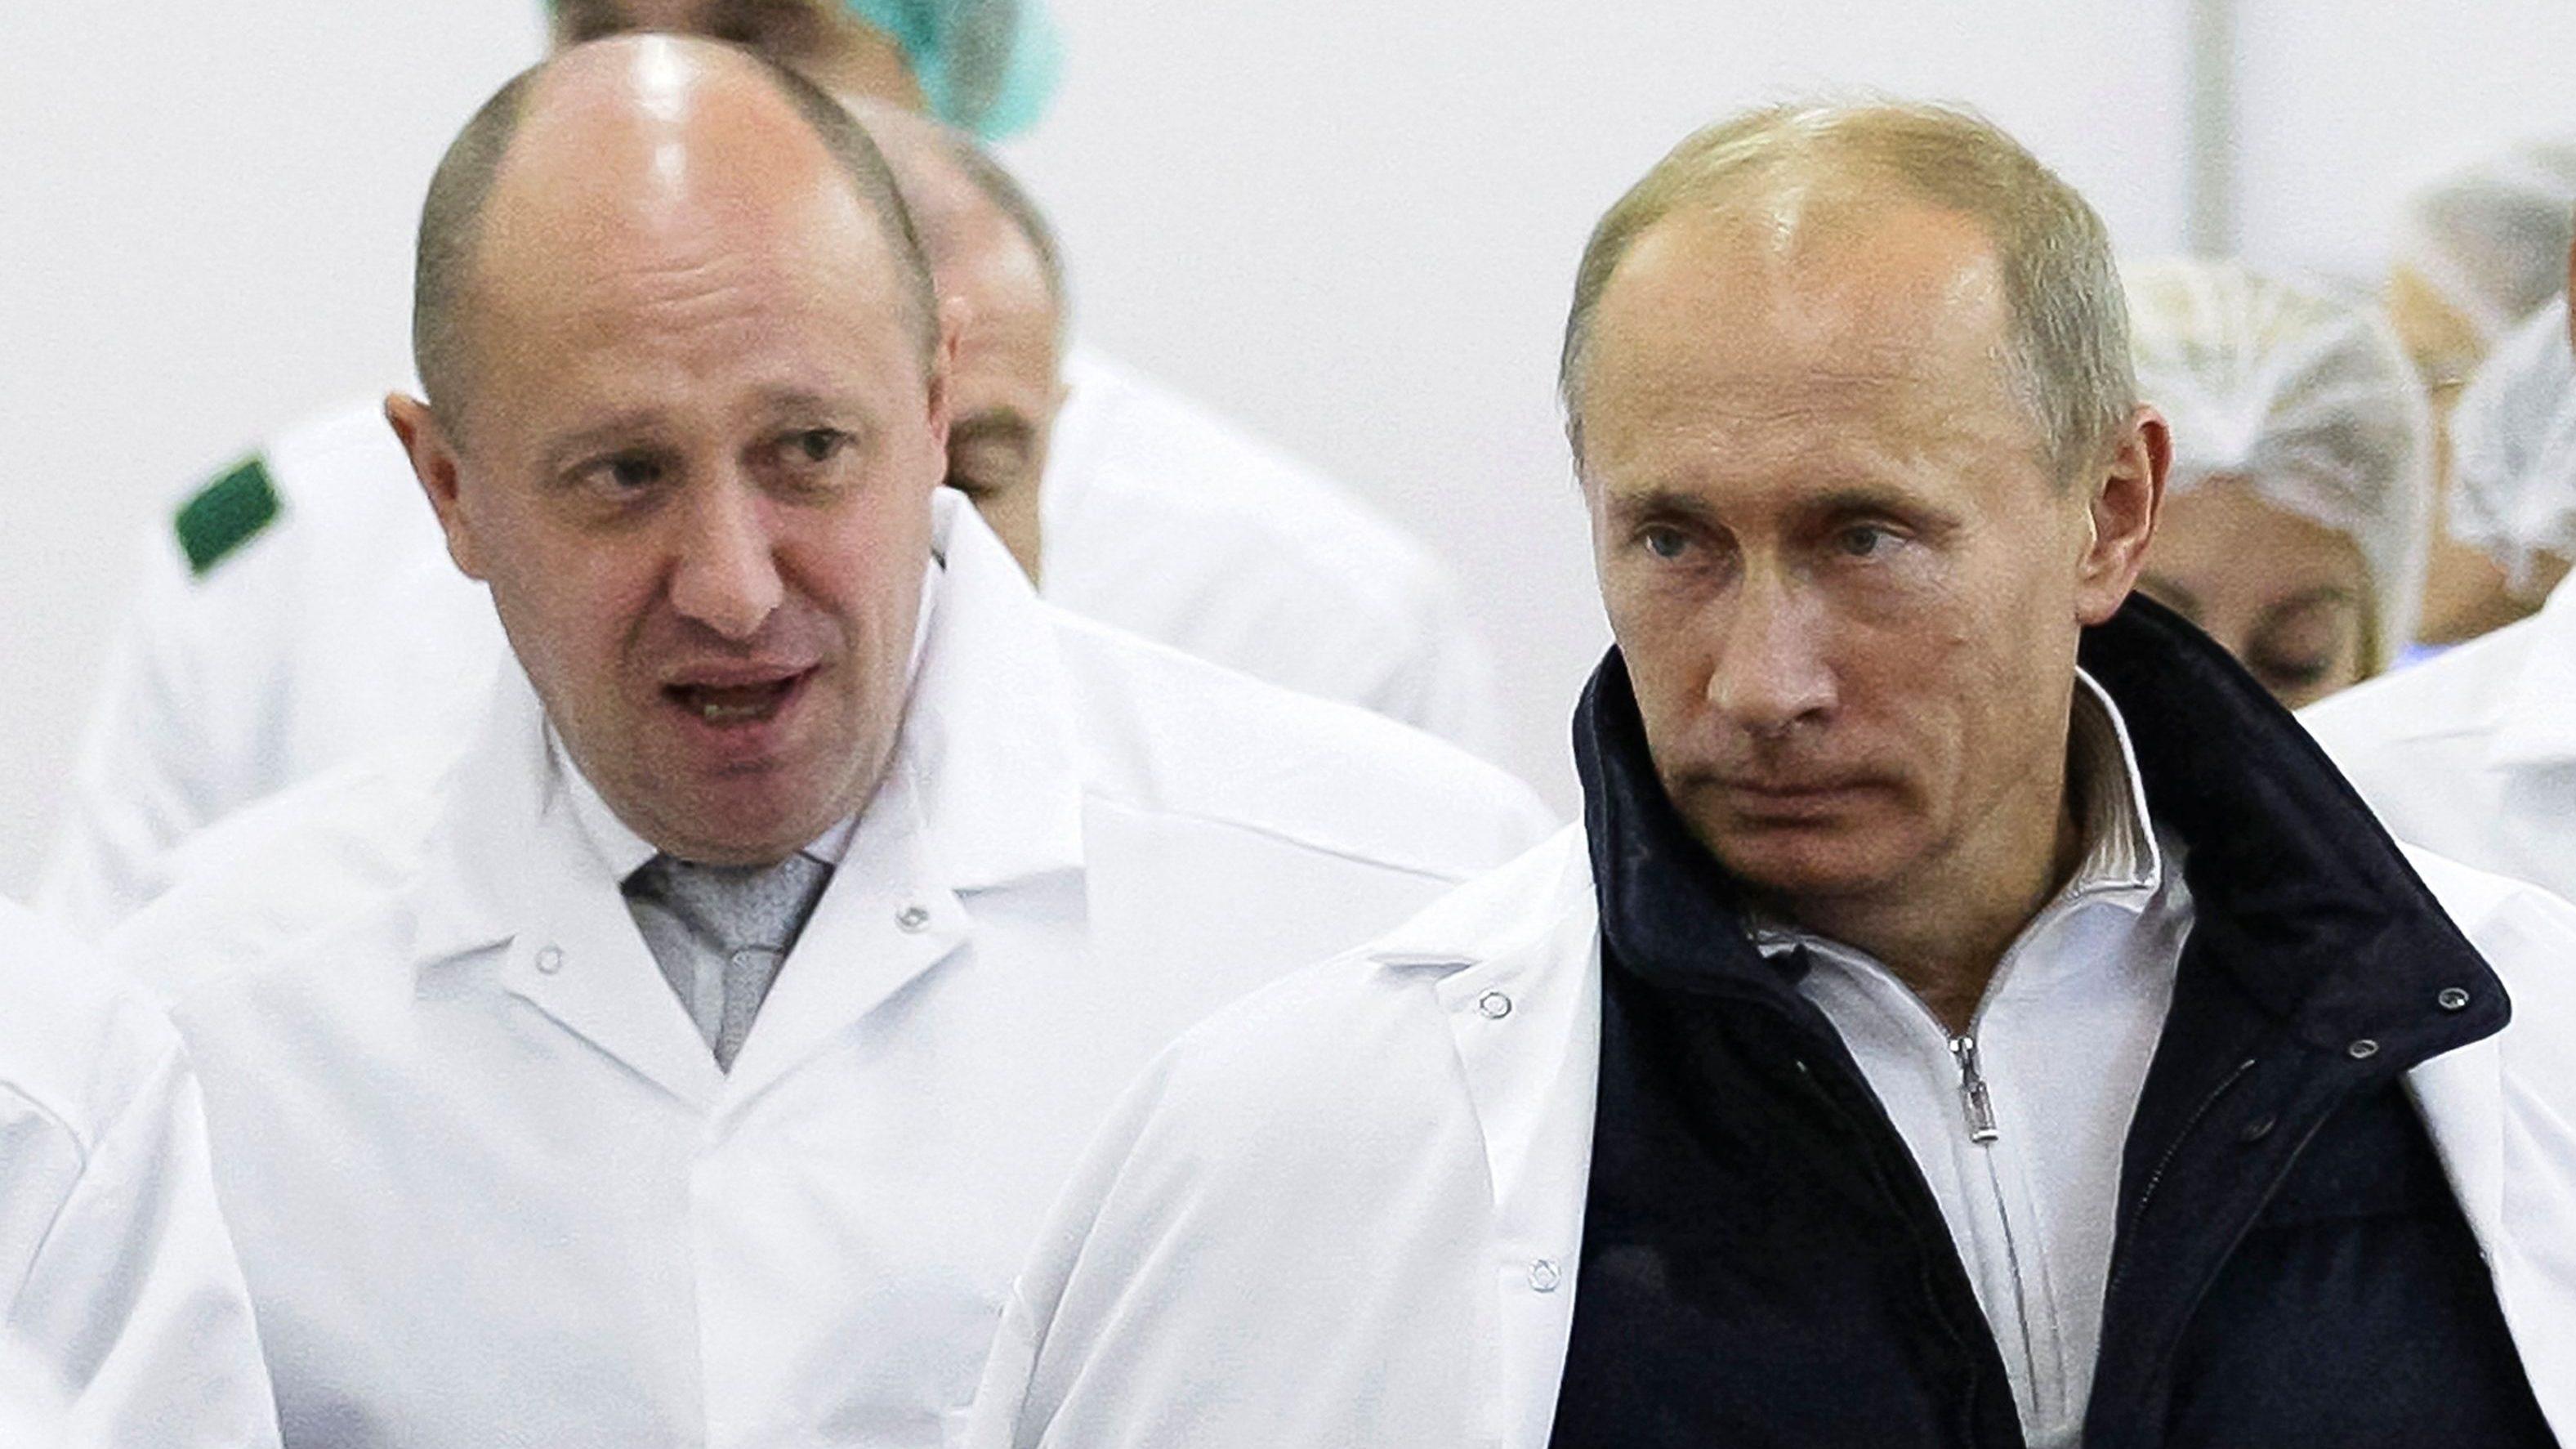 Troll farm oligarch Yevgeny Prigozhin acts on Putin's orders